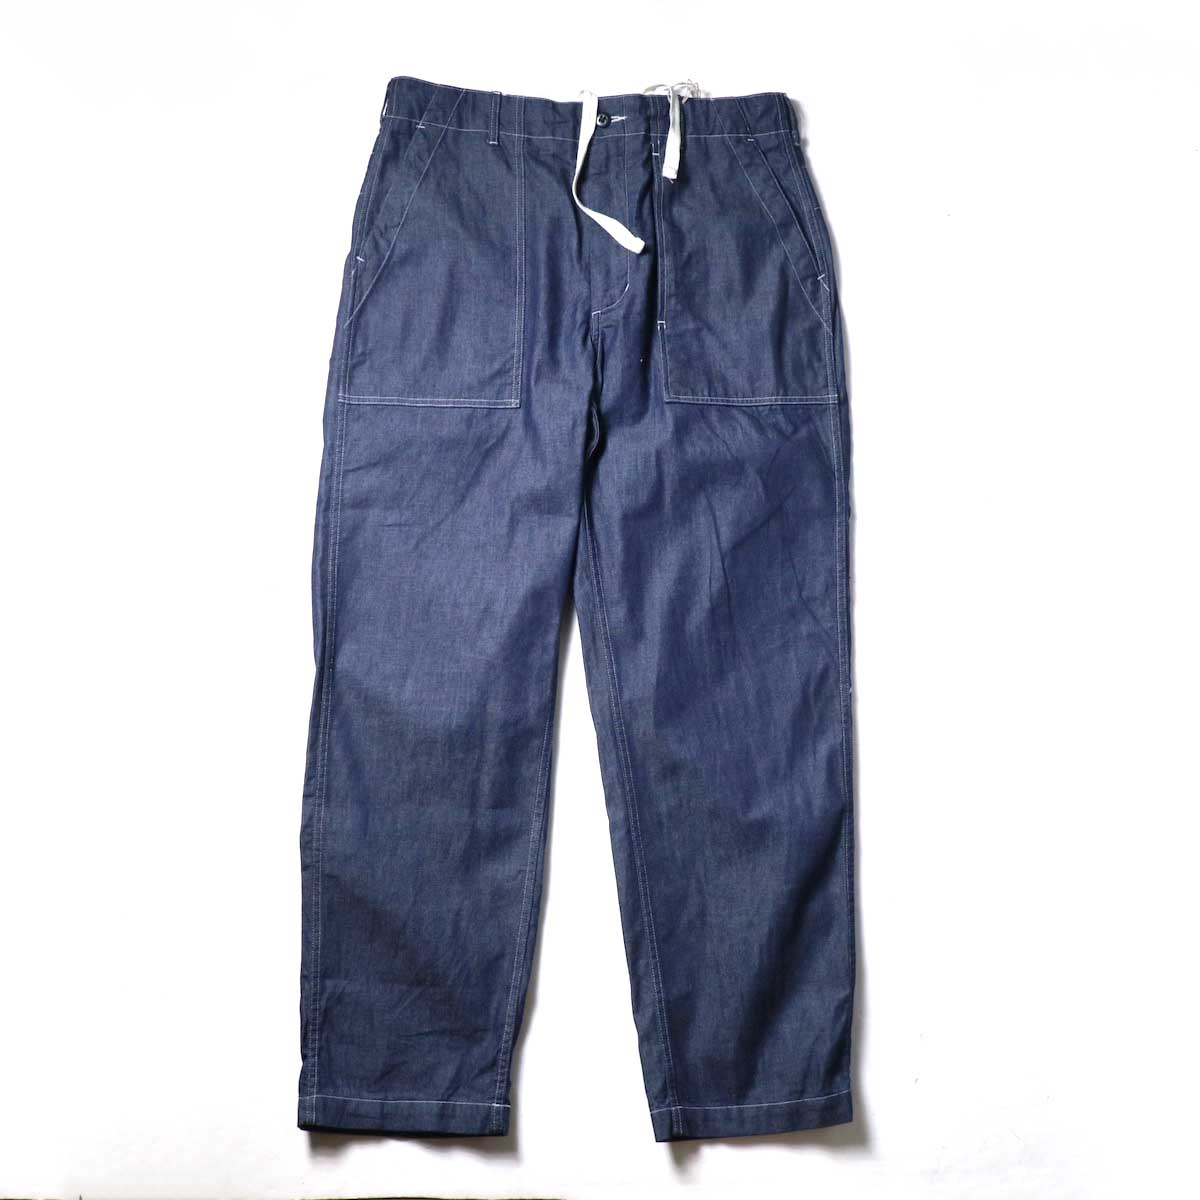 Engineered Garments / Fatigue Pant - 8oz Cone Denim (Indigo)